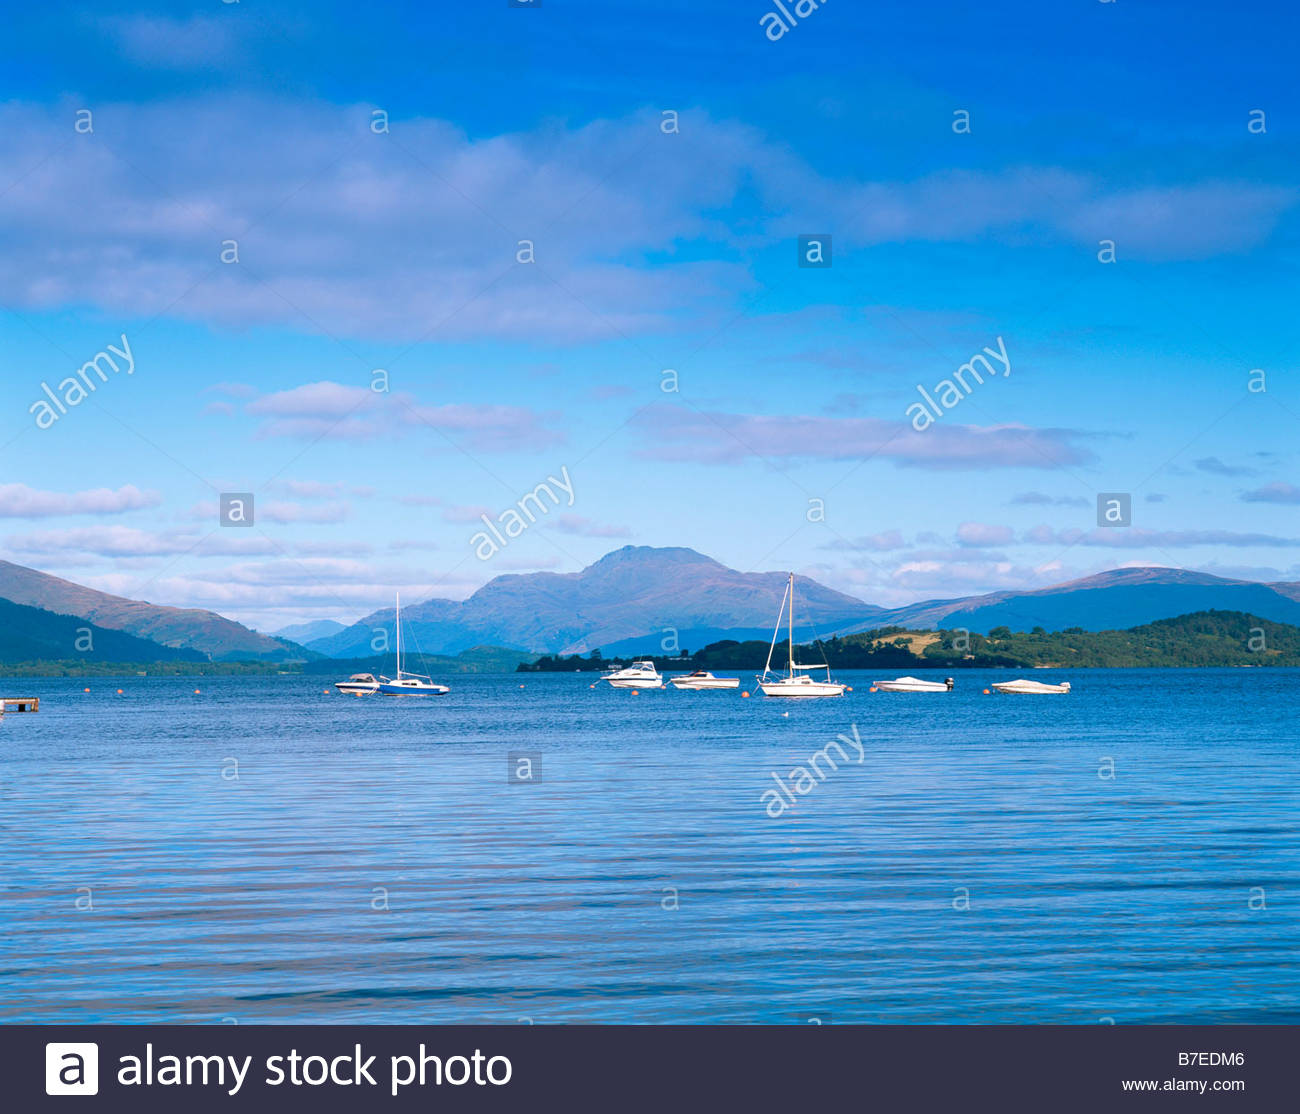 Duck Bay Marina >> Looking Across Loch Lomond To Ben Lomond From Duck Bay